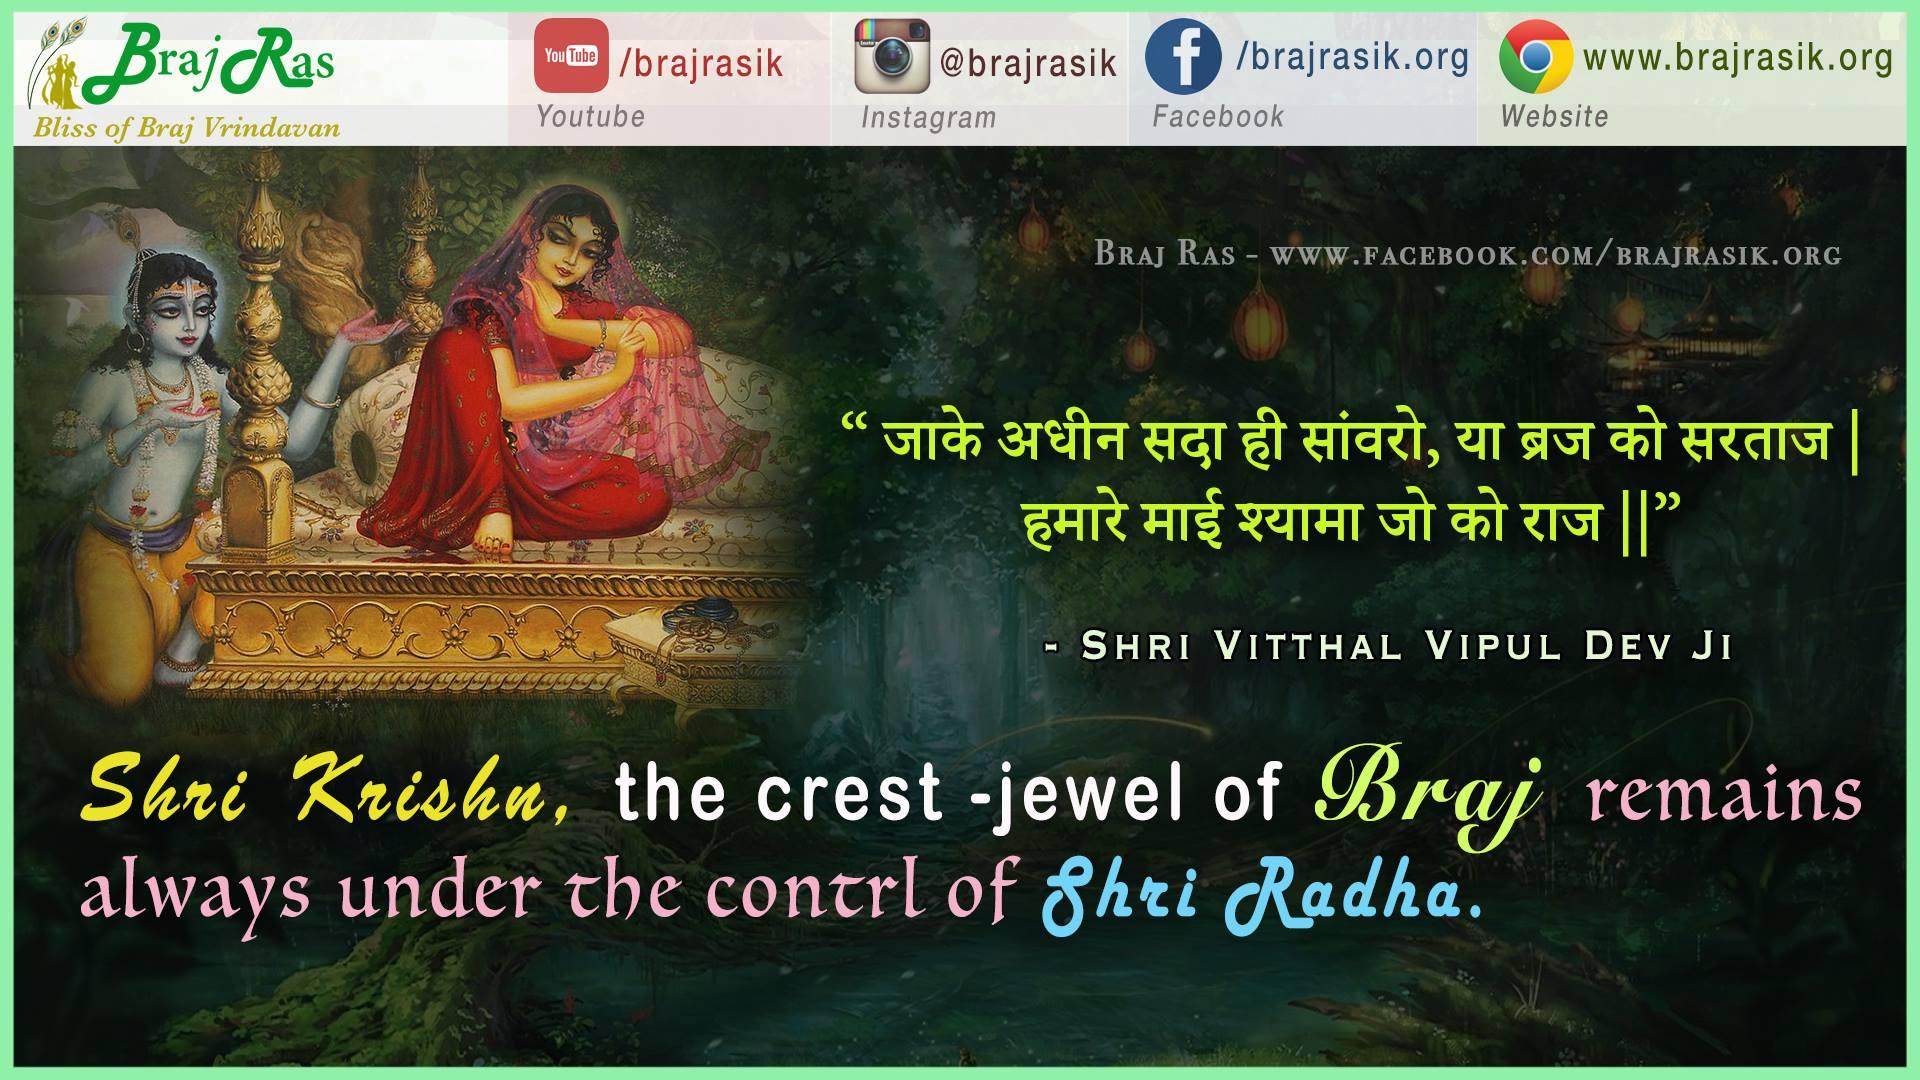 Jake Adheen Sada Hi Sanwaro - Shri Vitthal Vipul Dev Ji